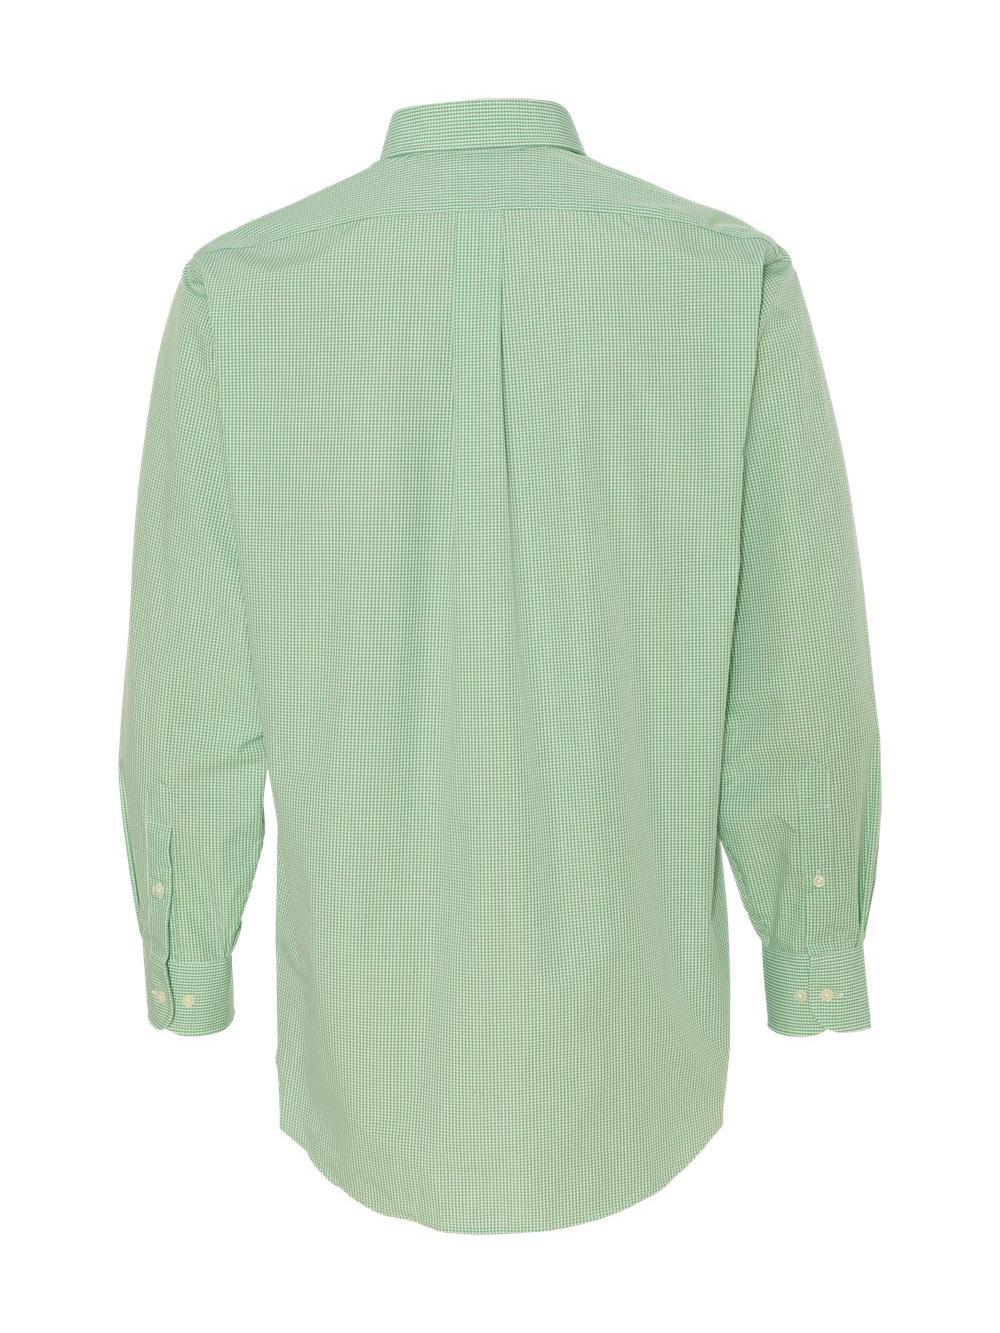 Gingham Check Shirt 13V0225 Van Heusen